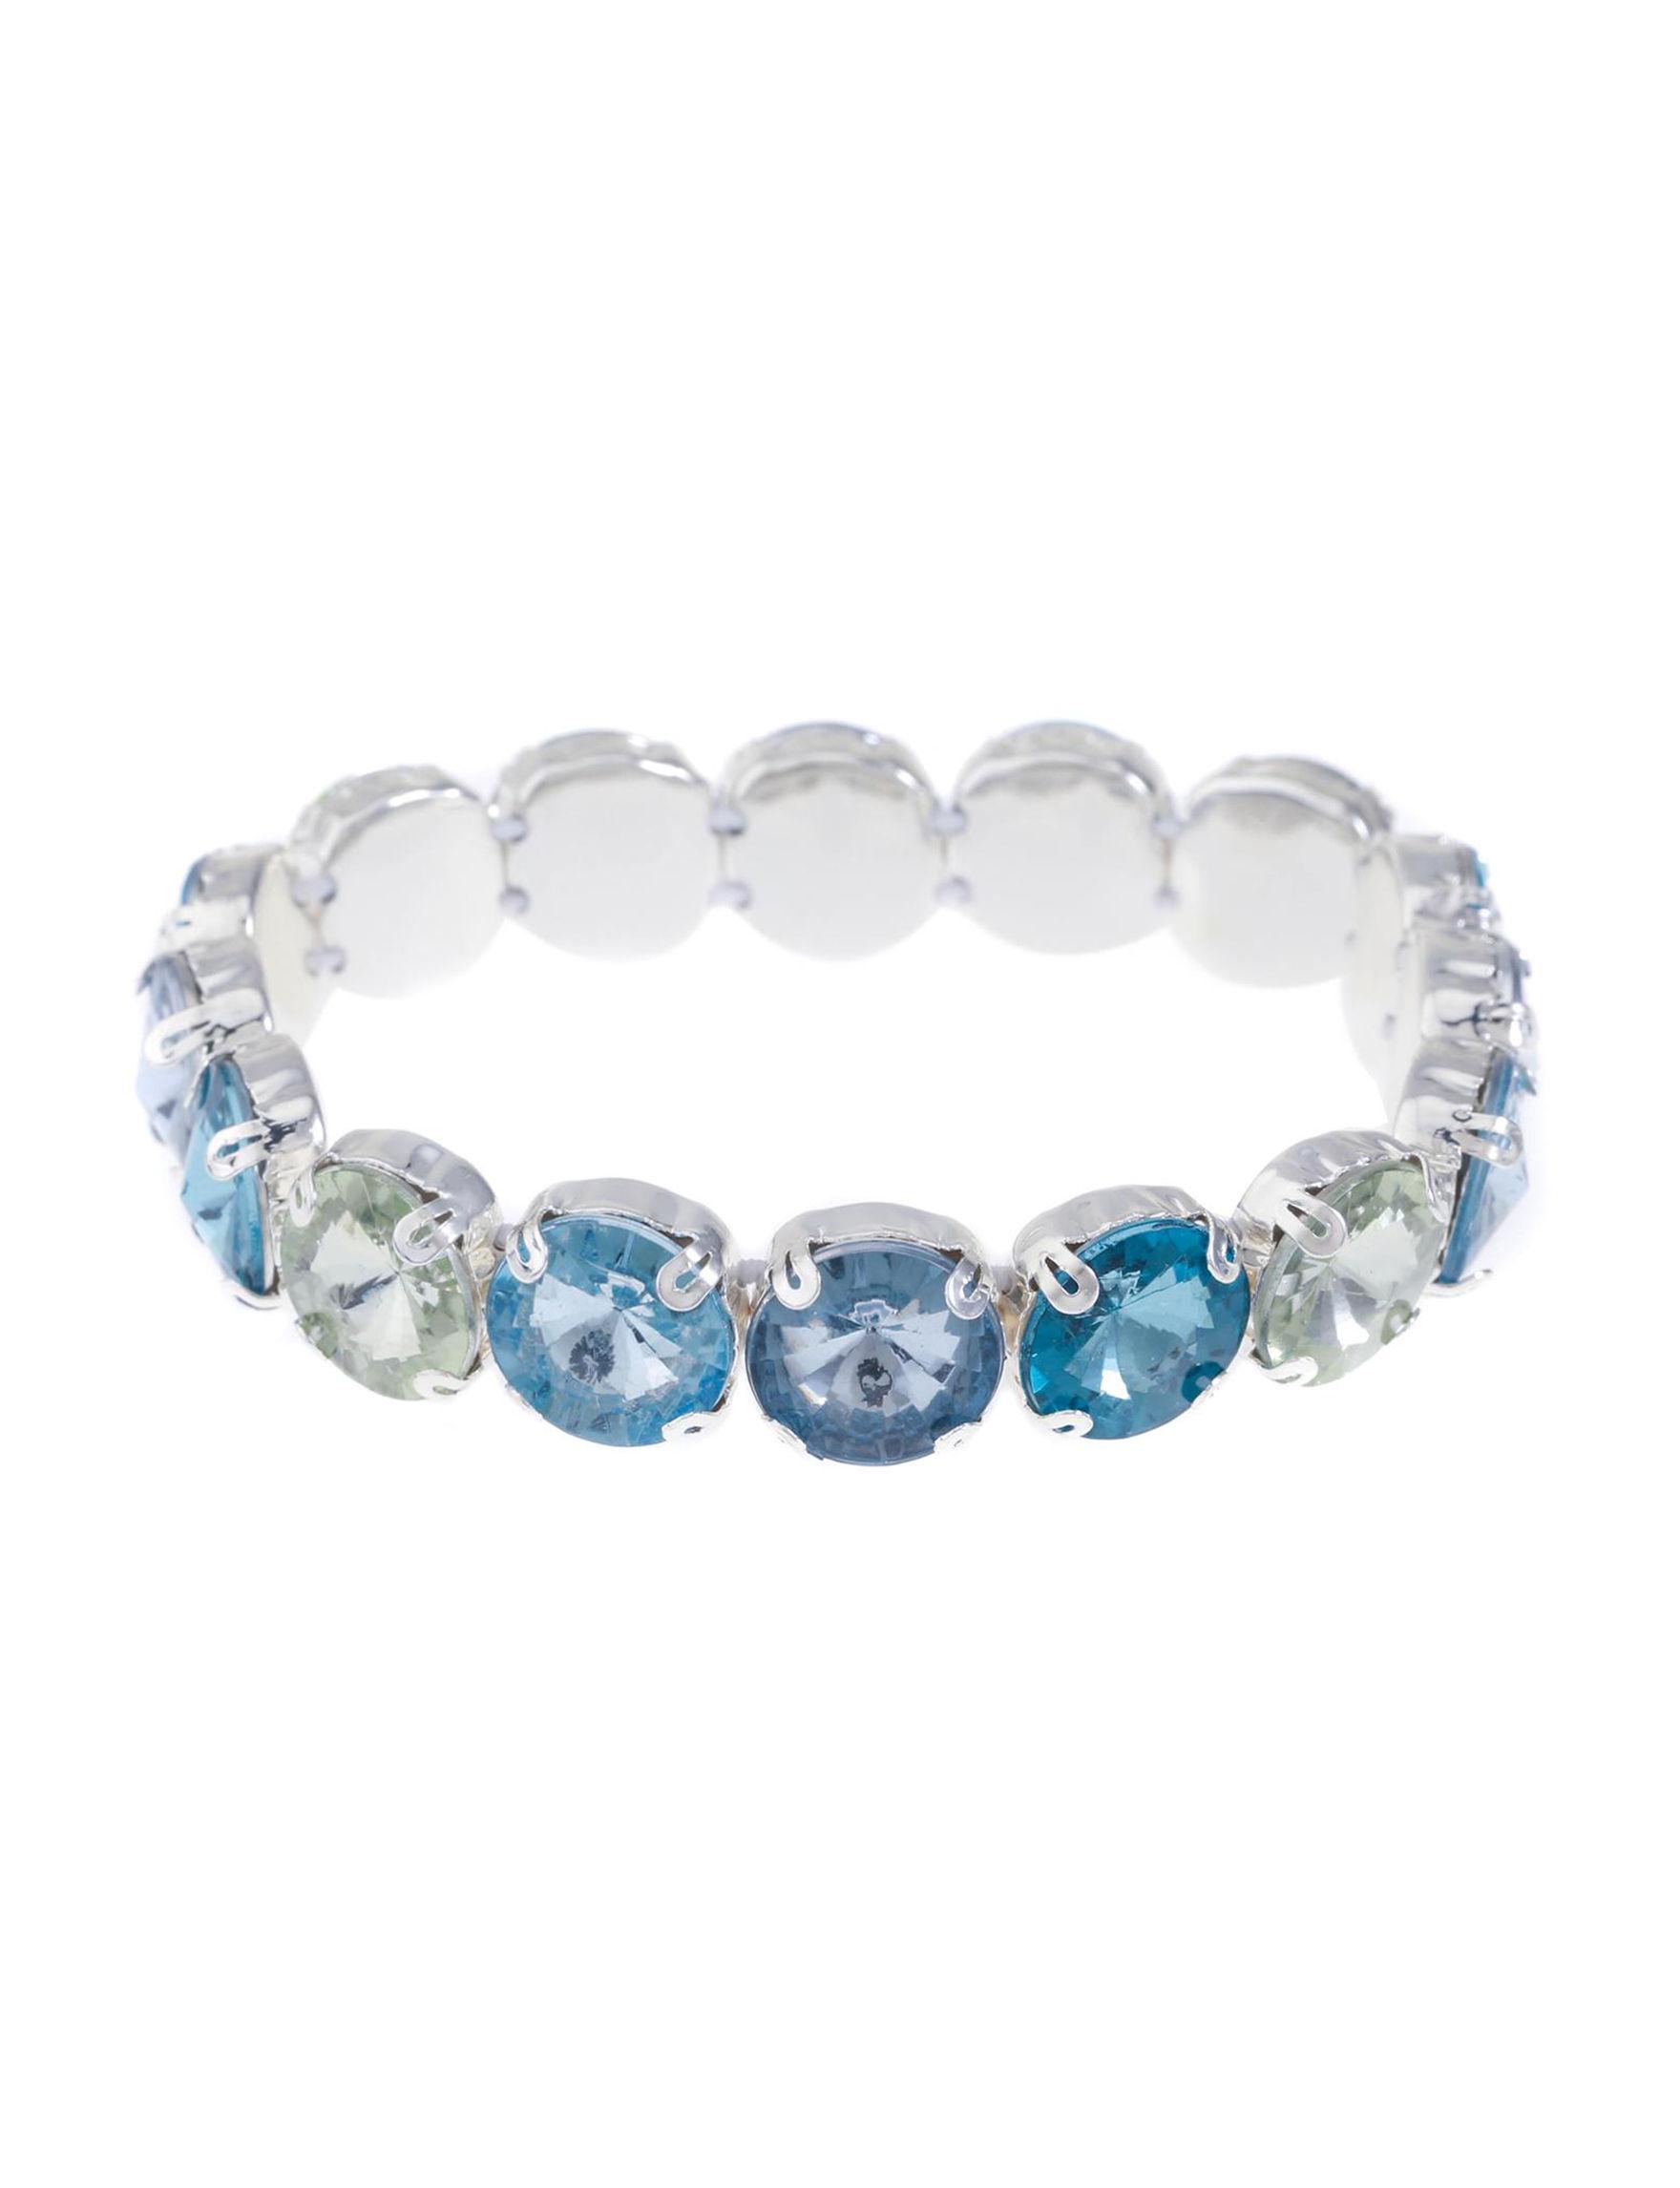 Gloria Vanderbilt Silver / Blue Stone Bracelets Fashion Jewelry